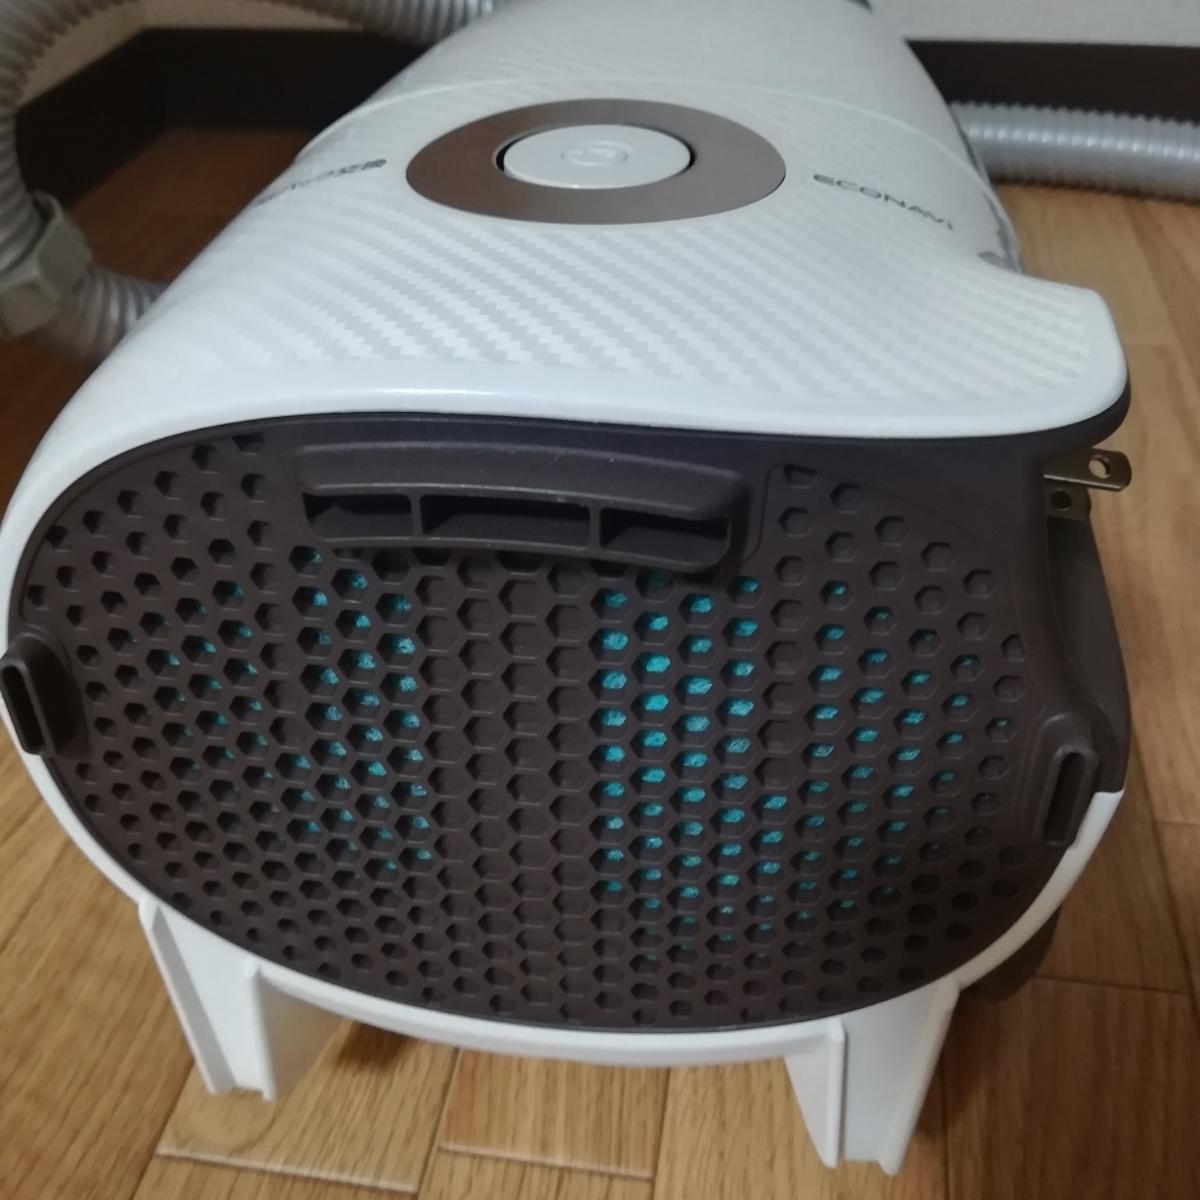 MC-SJP520G パナソニック 掃除機 新品紙パック付 送料無料 美品_画像3